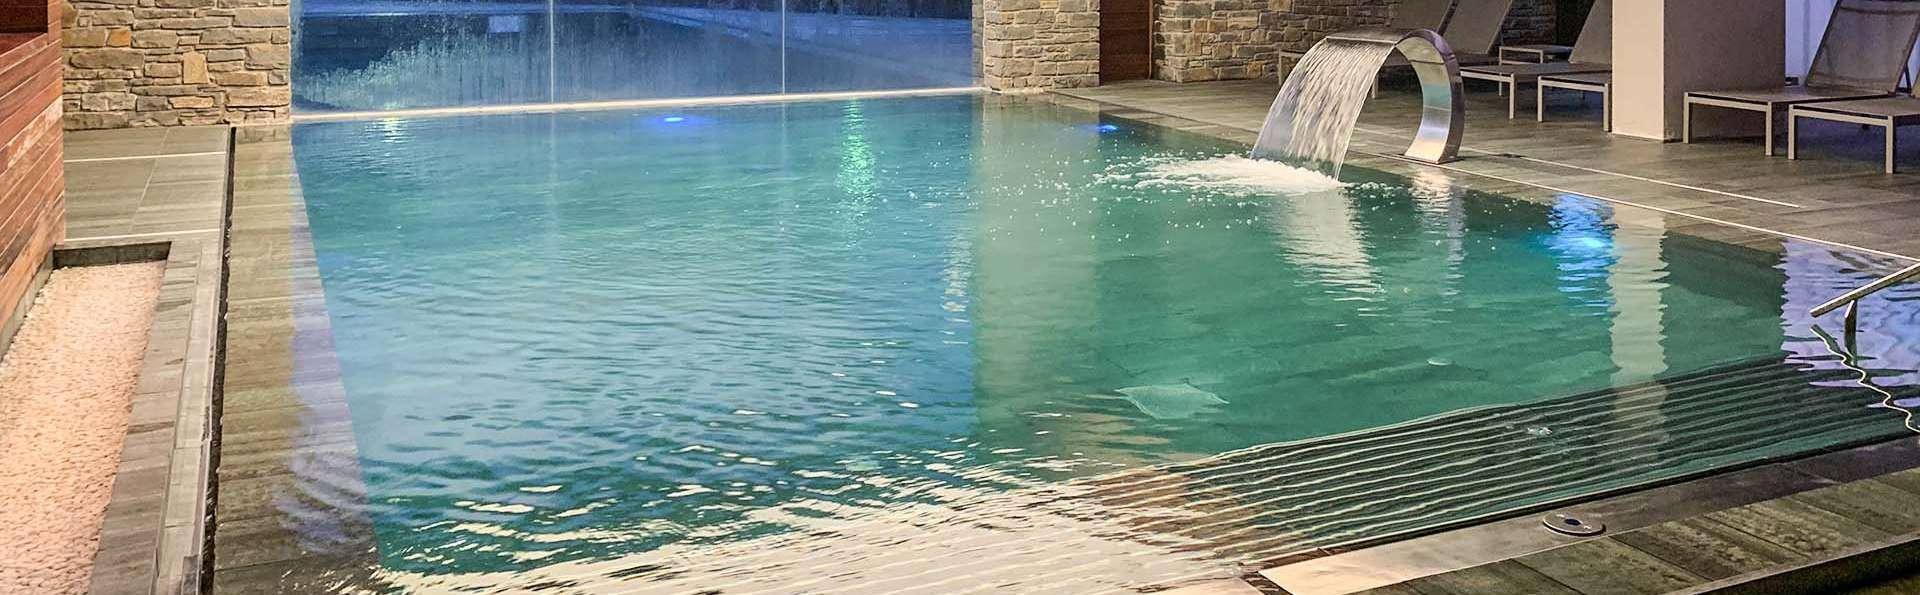 Aparthotel Siente Boí & Spa - EDIT_spa_piscina_02.jpg